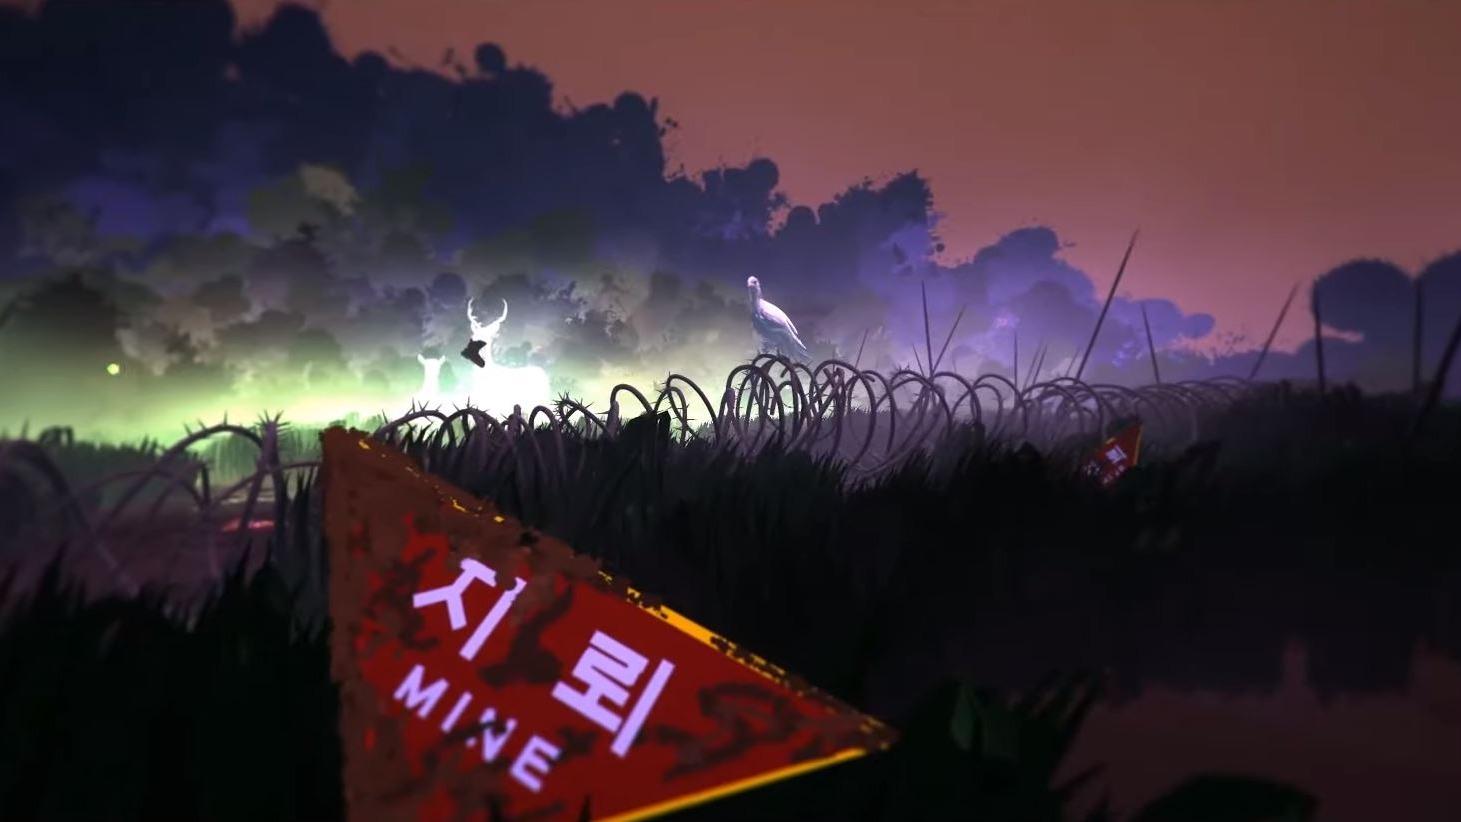 Gaze(DMZ)